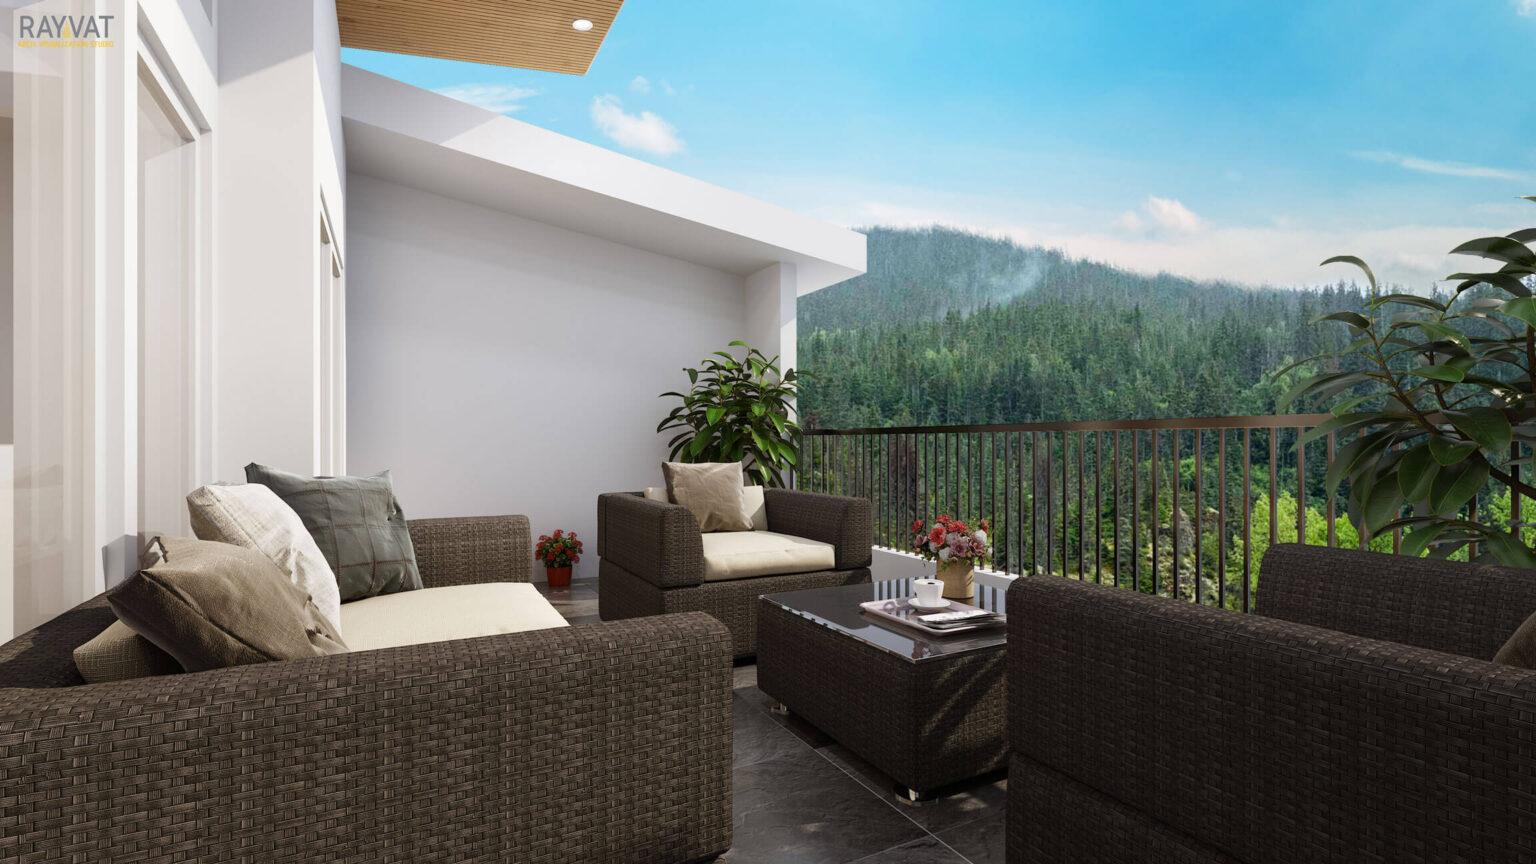 A Dreamy Deck, 3D Deck Render, Washington, USA